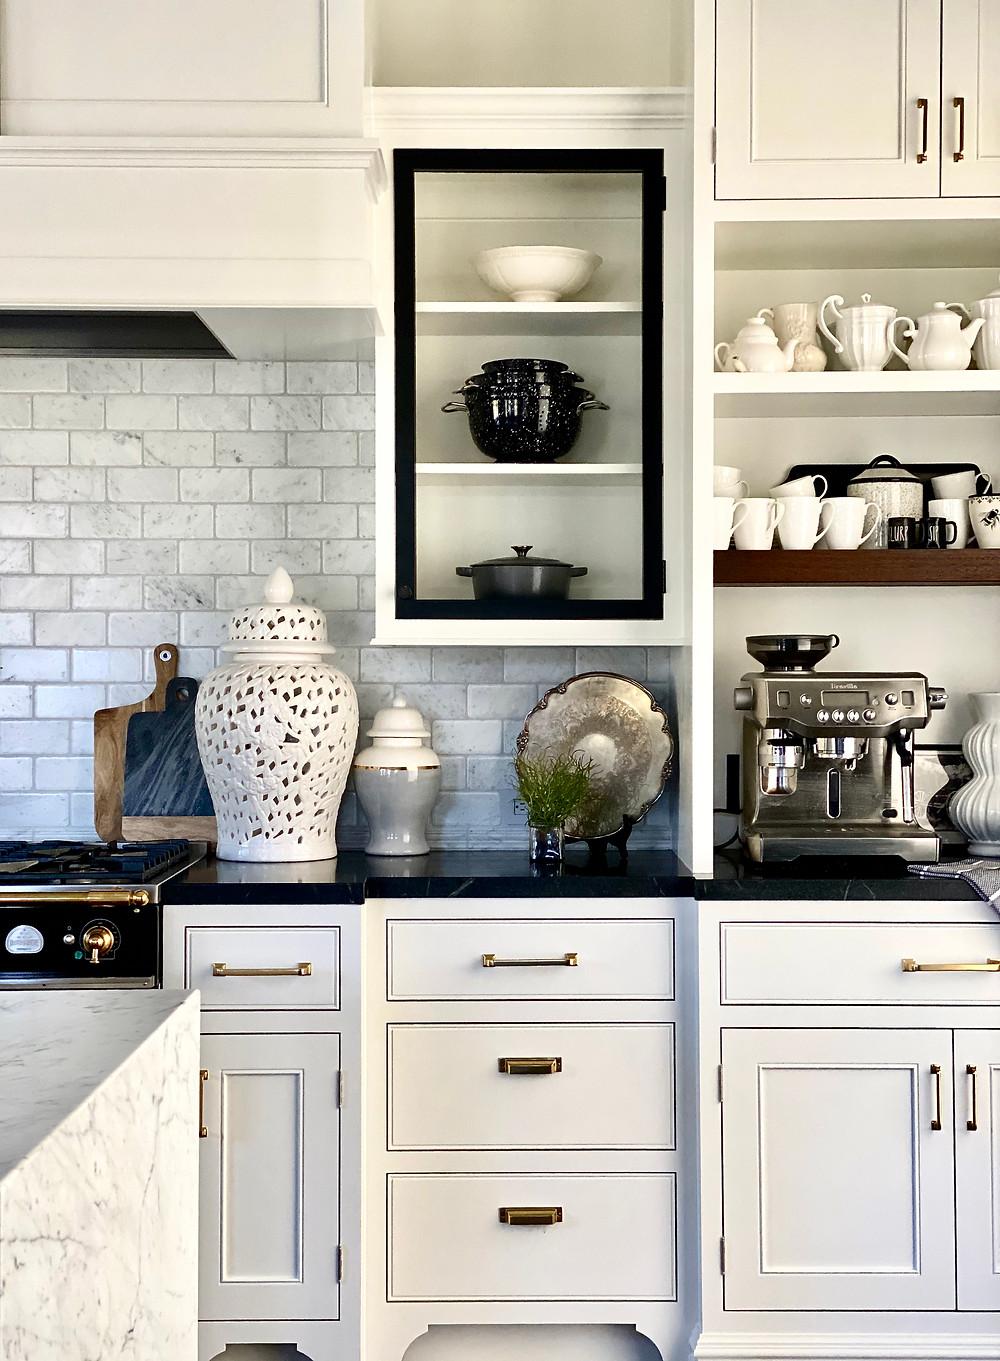 Beautiful kitchen reveal, SSDesignHub at RockHavenFarm.com.